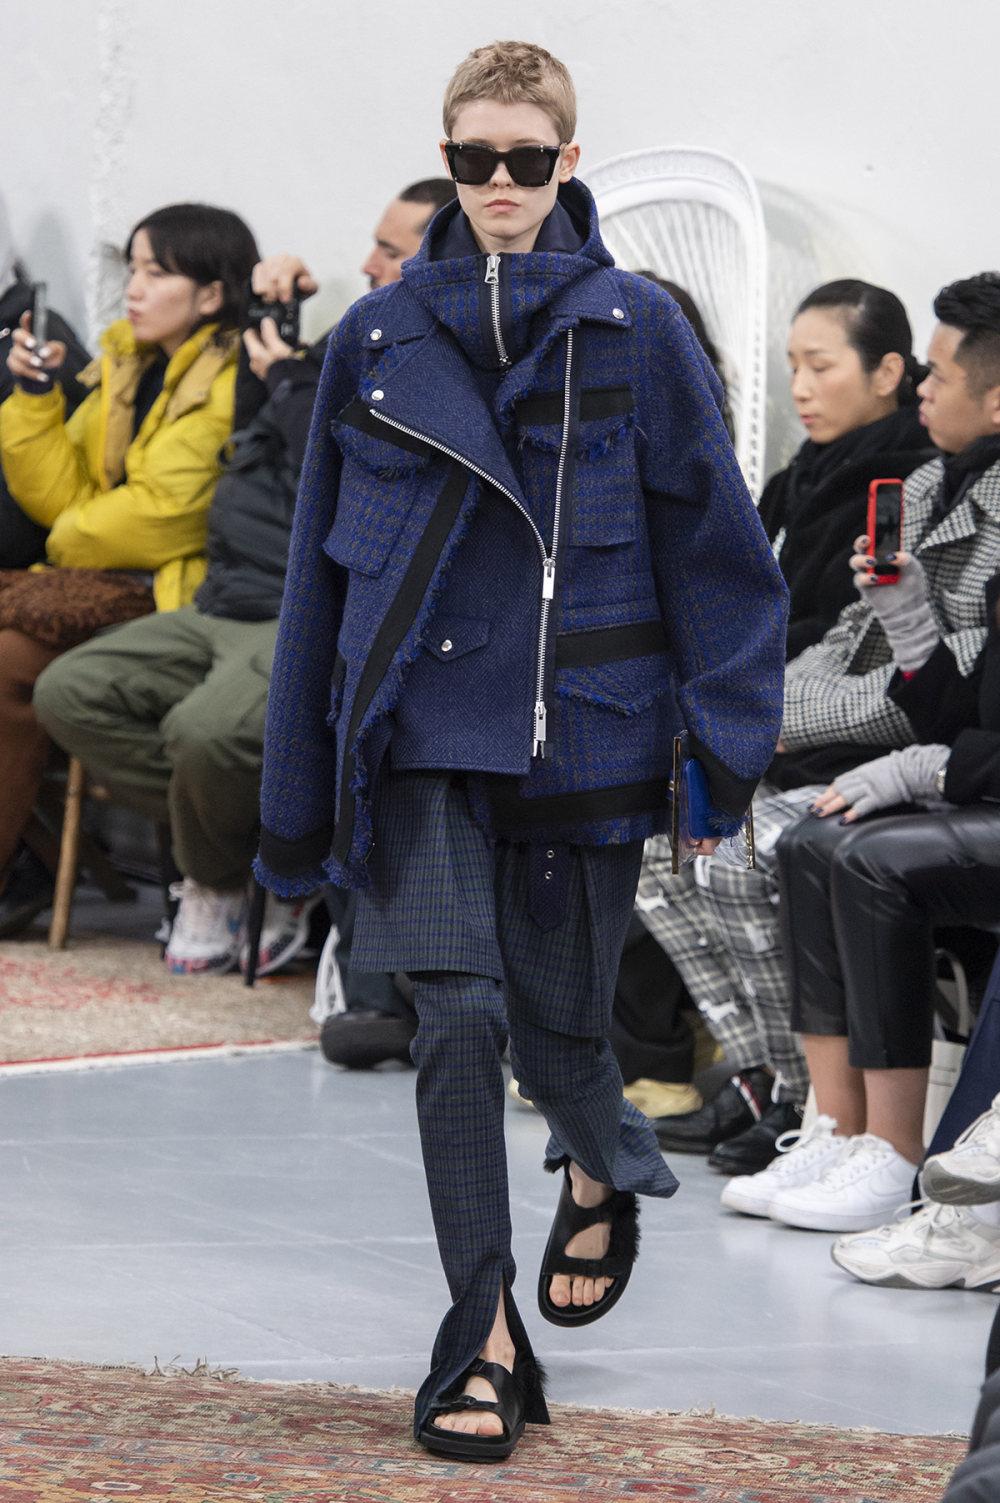 Sacai时装系列超大号黑色圆领毛衣和长款绿色北欧毛衣连衣裙-24.jpg